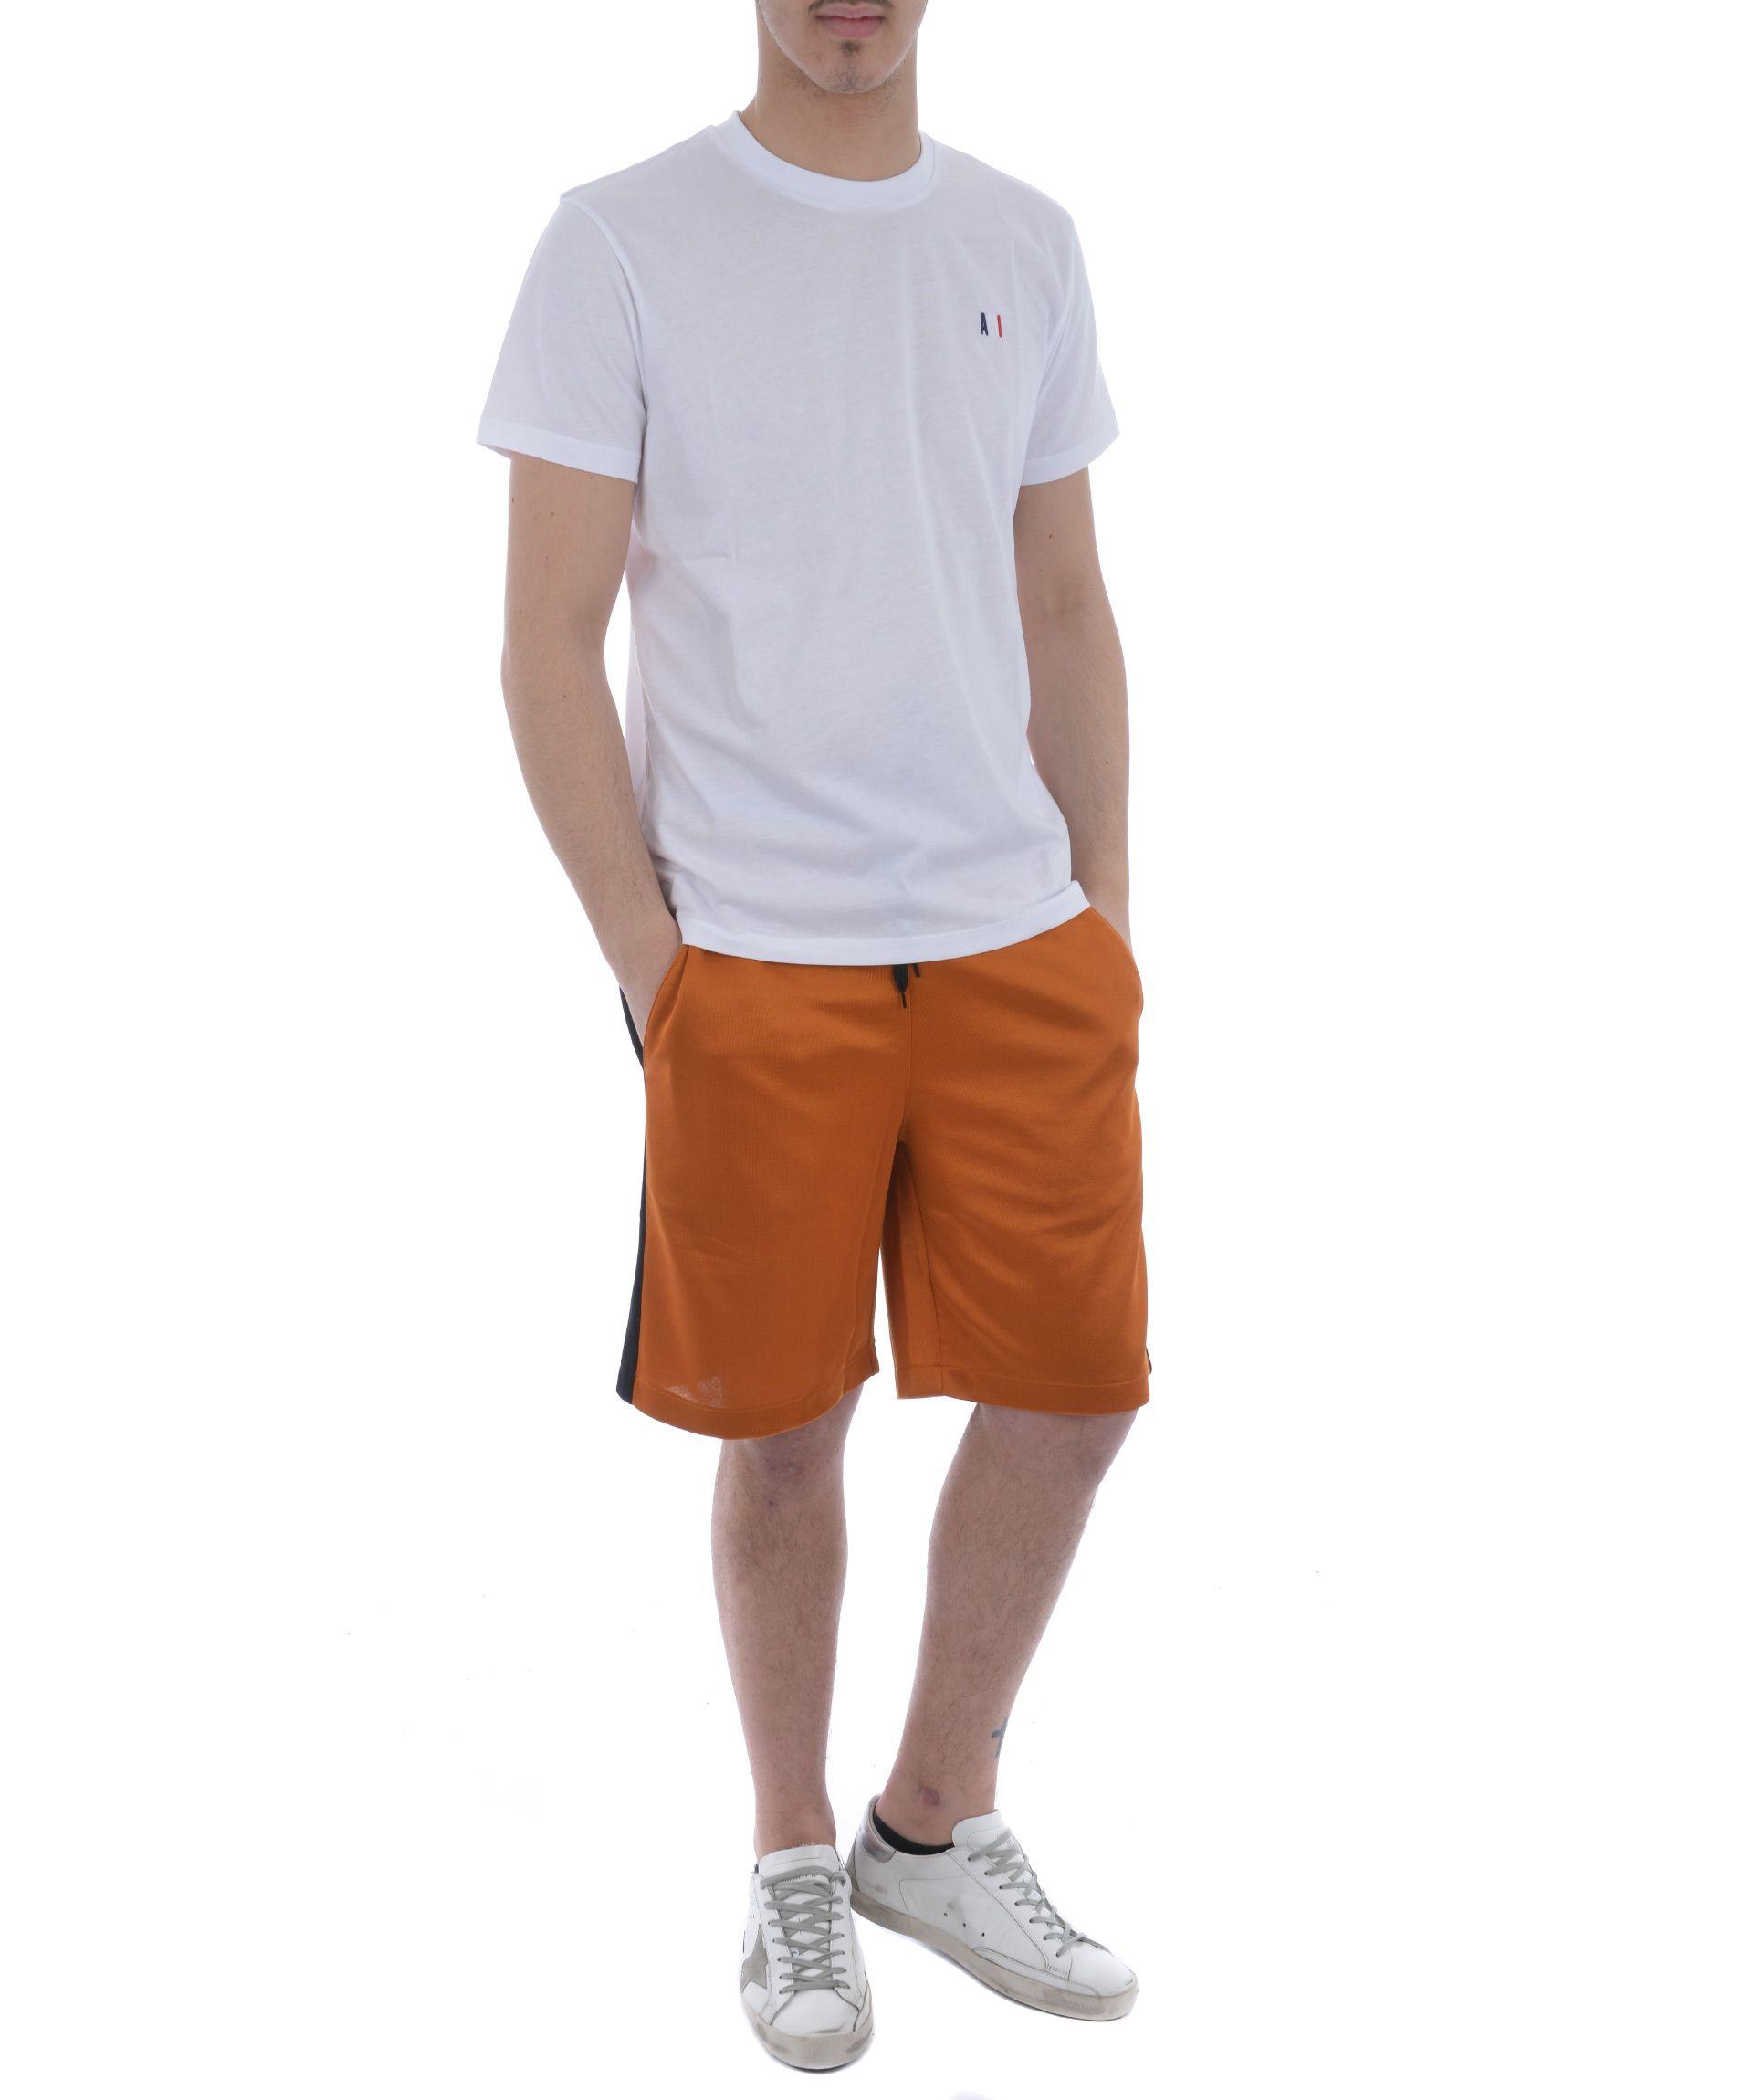 Ami Alexandre Mattiussi Side Striped Shorts